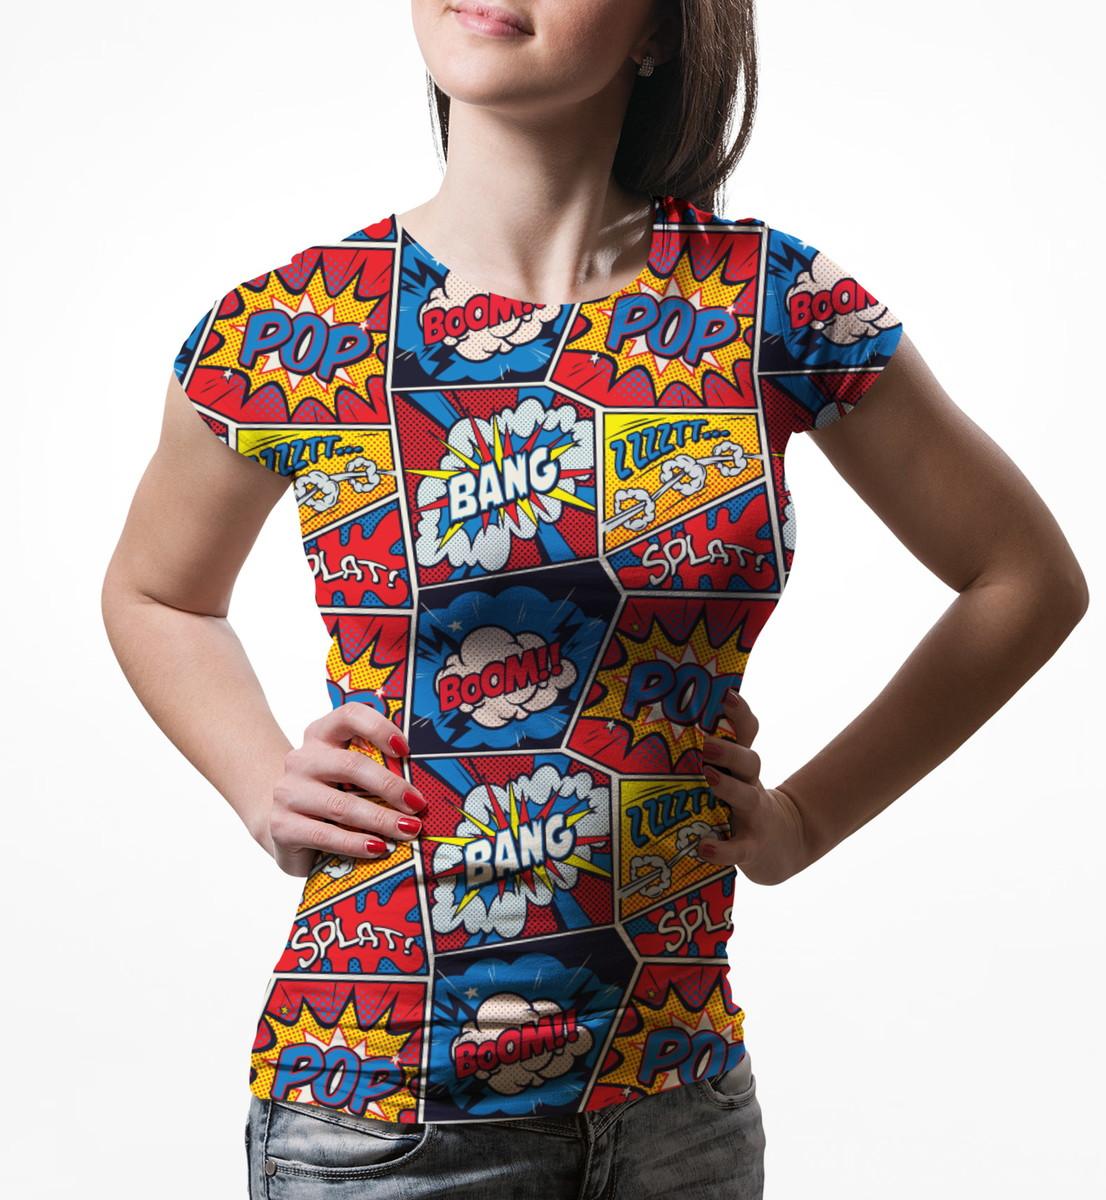 ae8cbc8093 Camiseta Baby Look Feminina Retro Pop Arte Estampa Total no Elo7 ...